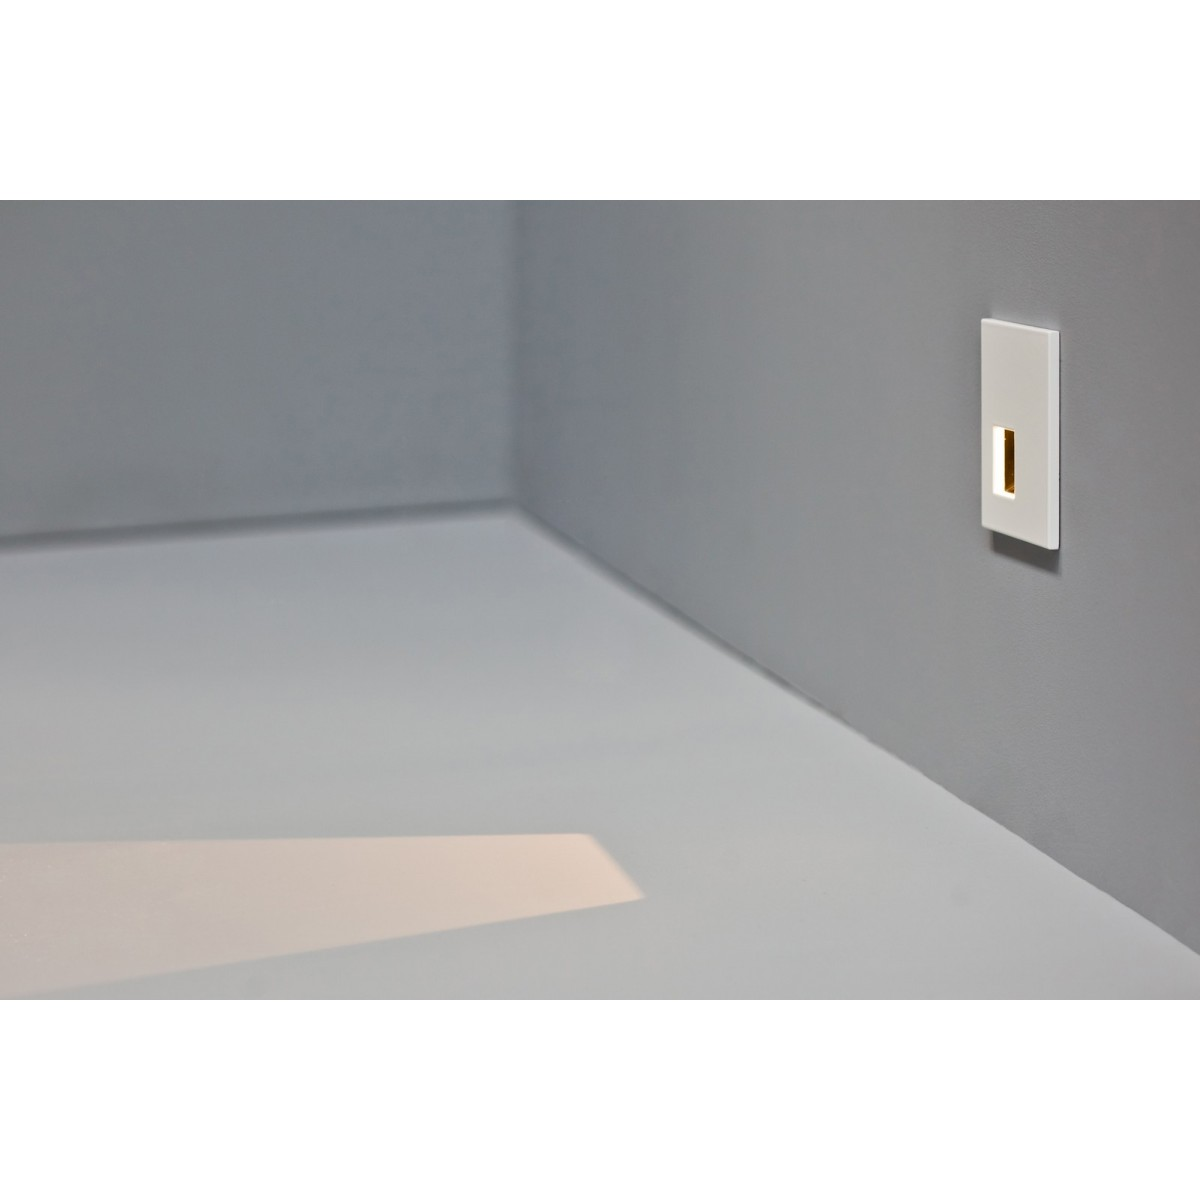 Labra WALK'Y LED Schodowe